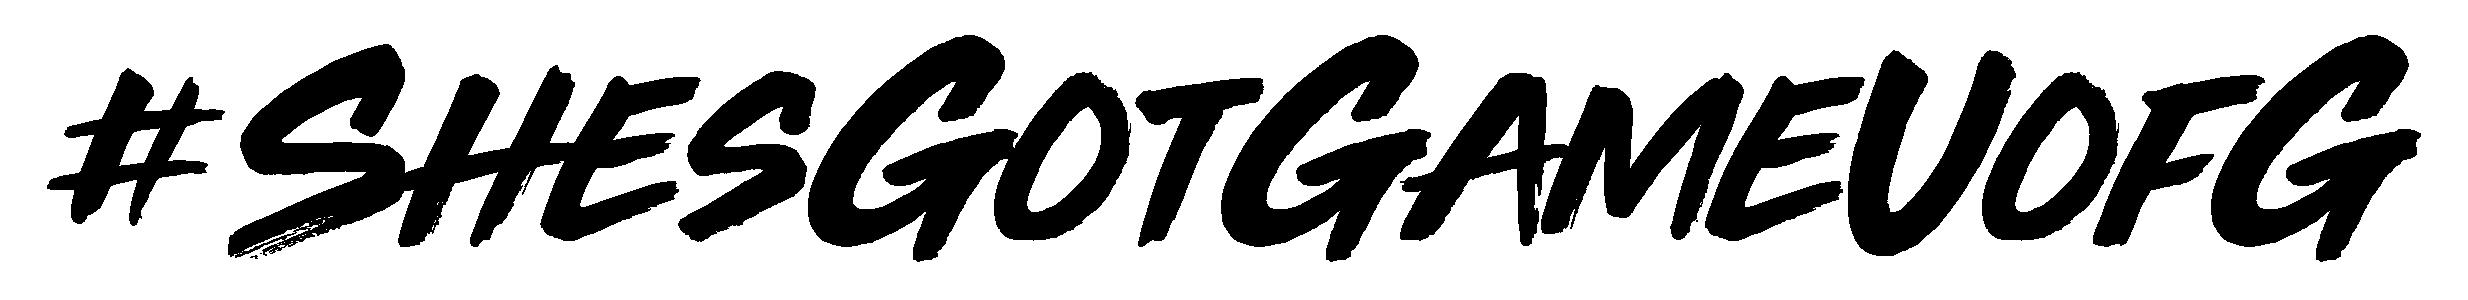 SGG-logos-hashtag-black-01.png